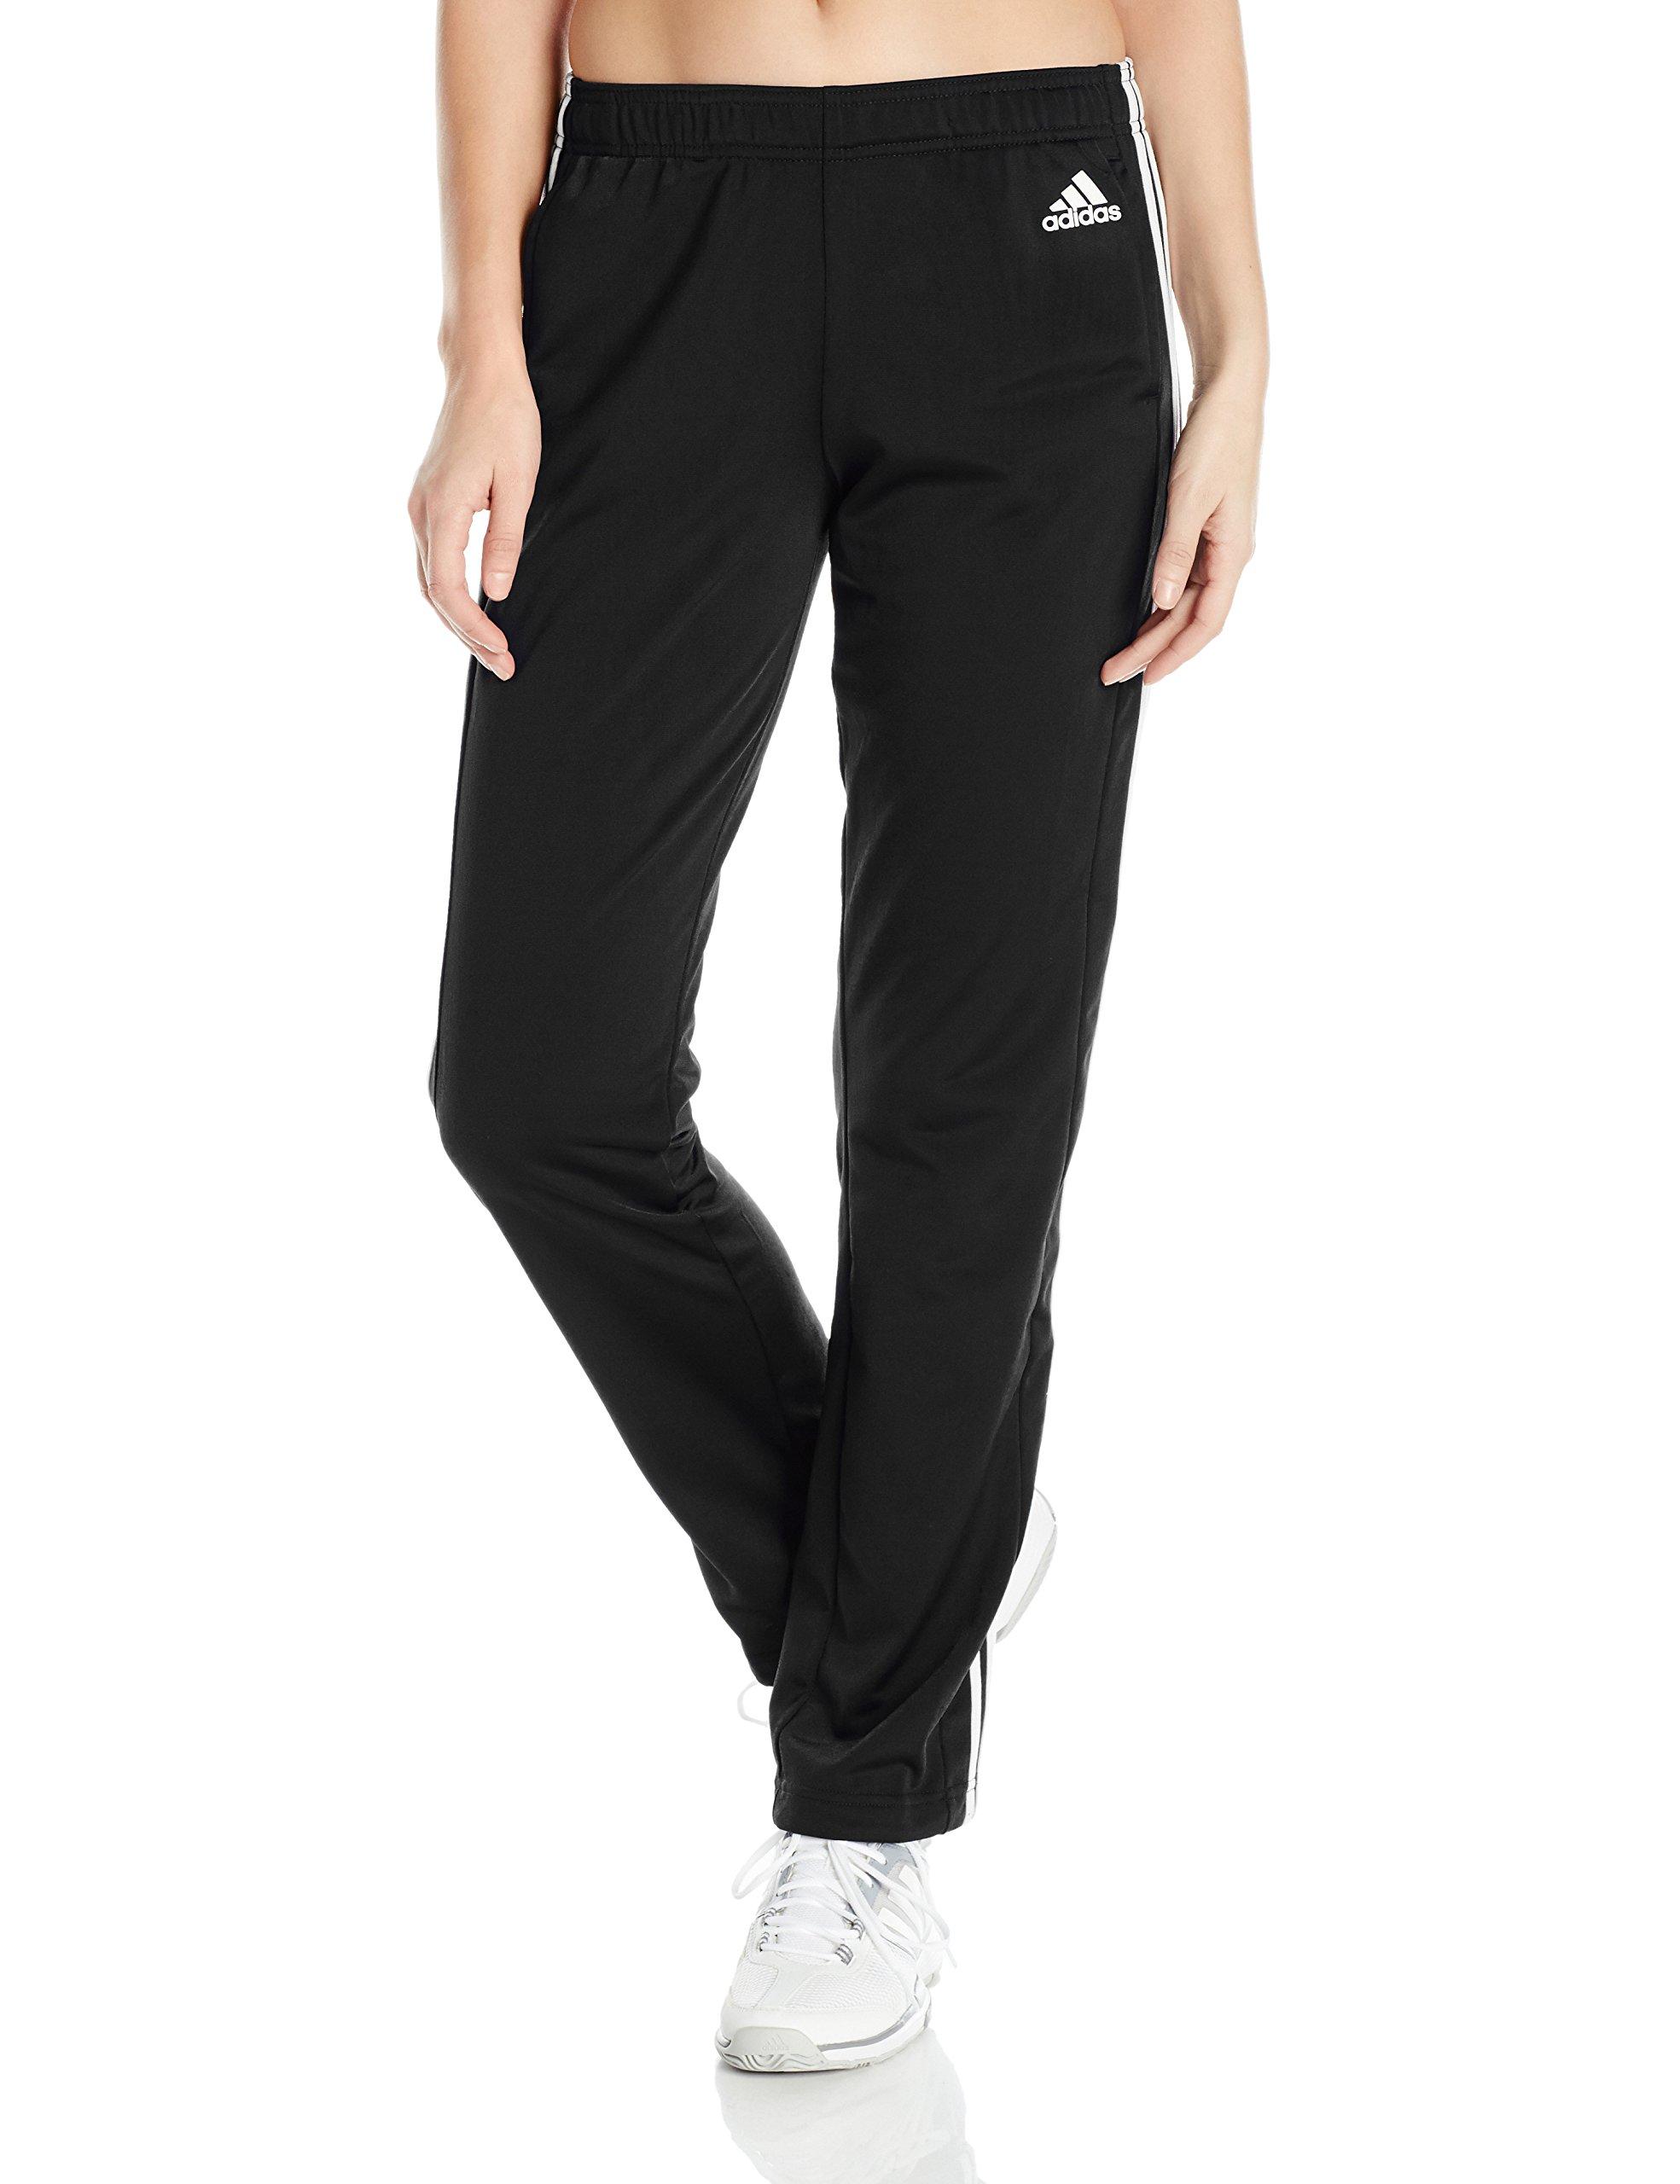 adidas Women's Designed 2 Move Straight Pants, Black/White, XX-Small